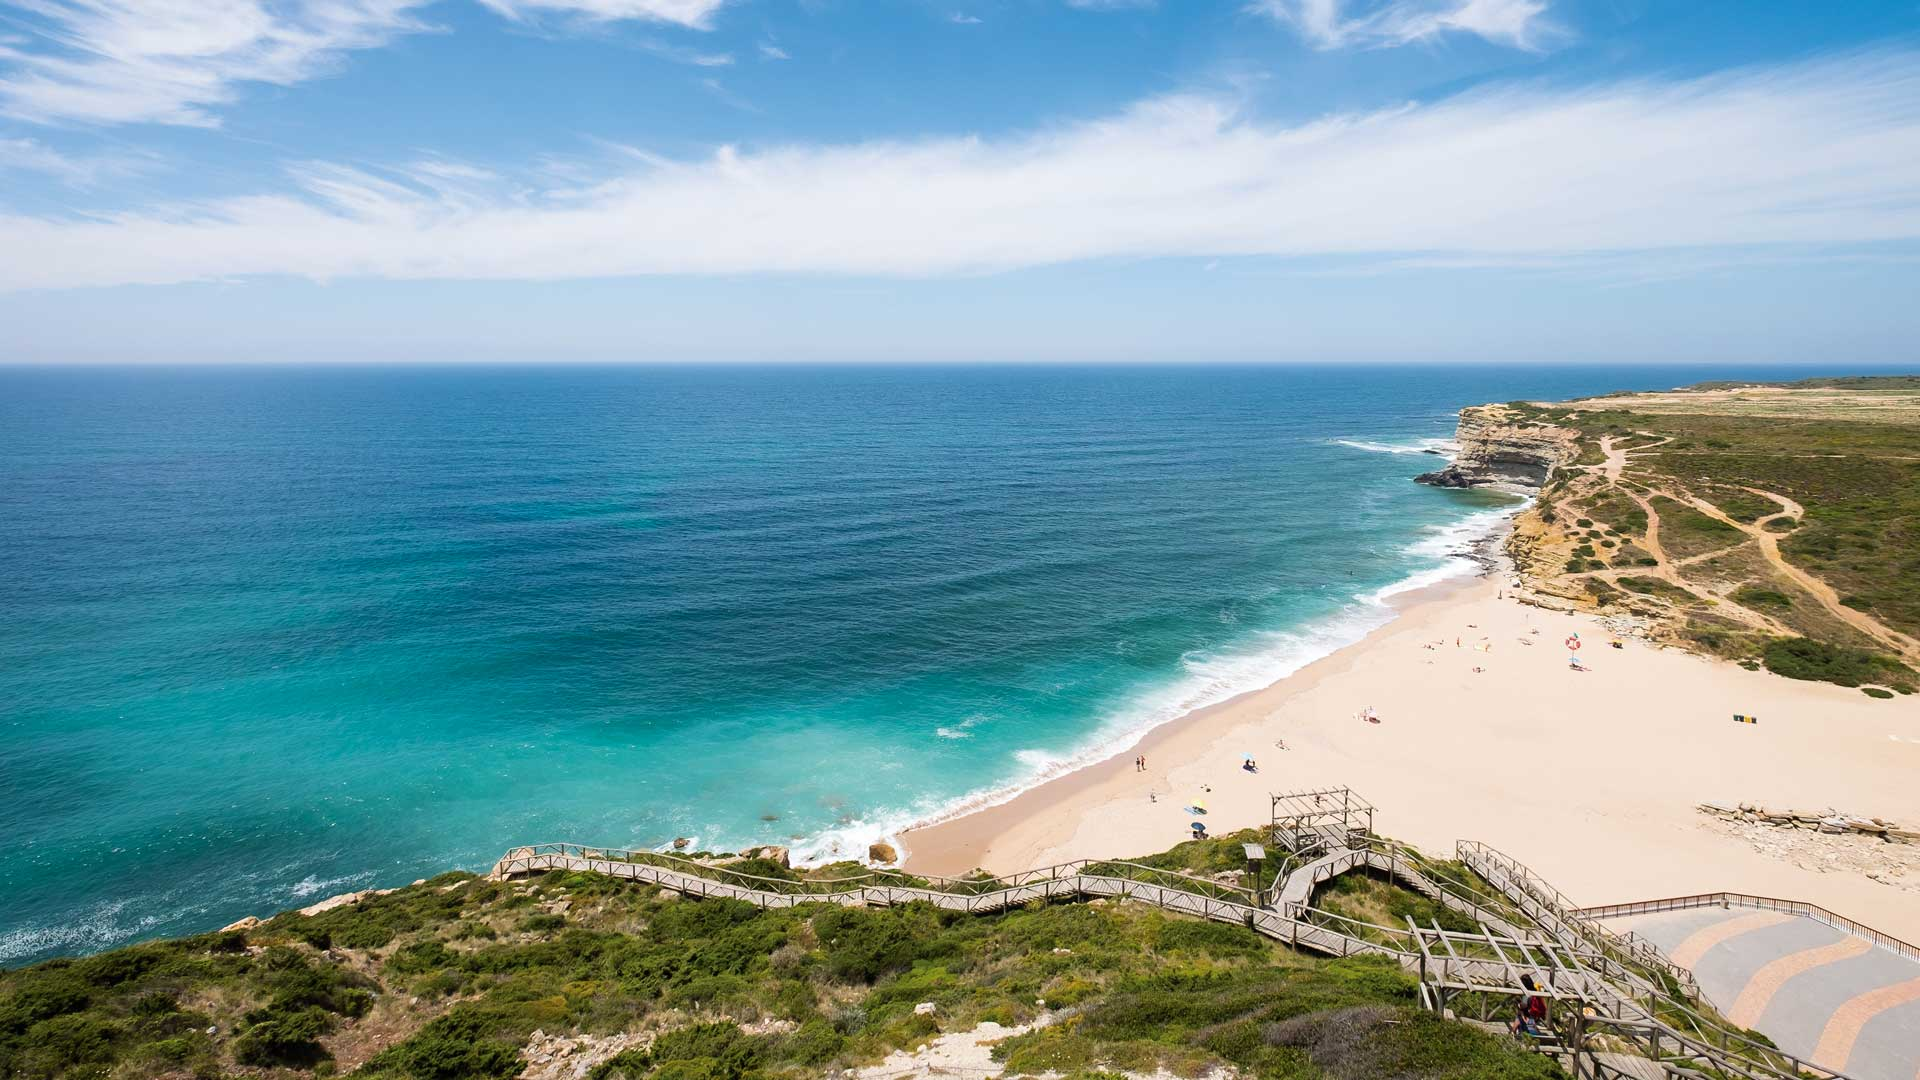 Guía de viaje para conocer Ericeira, Portugal